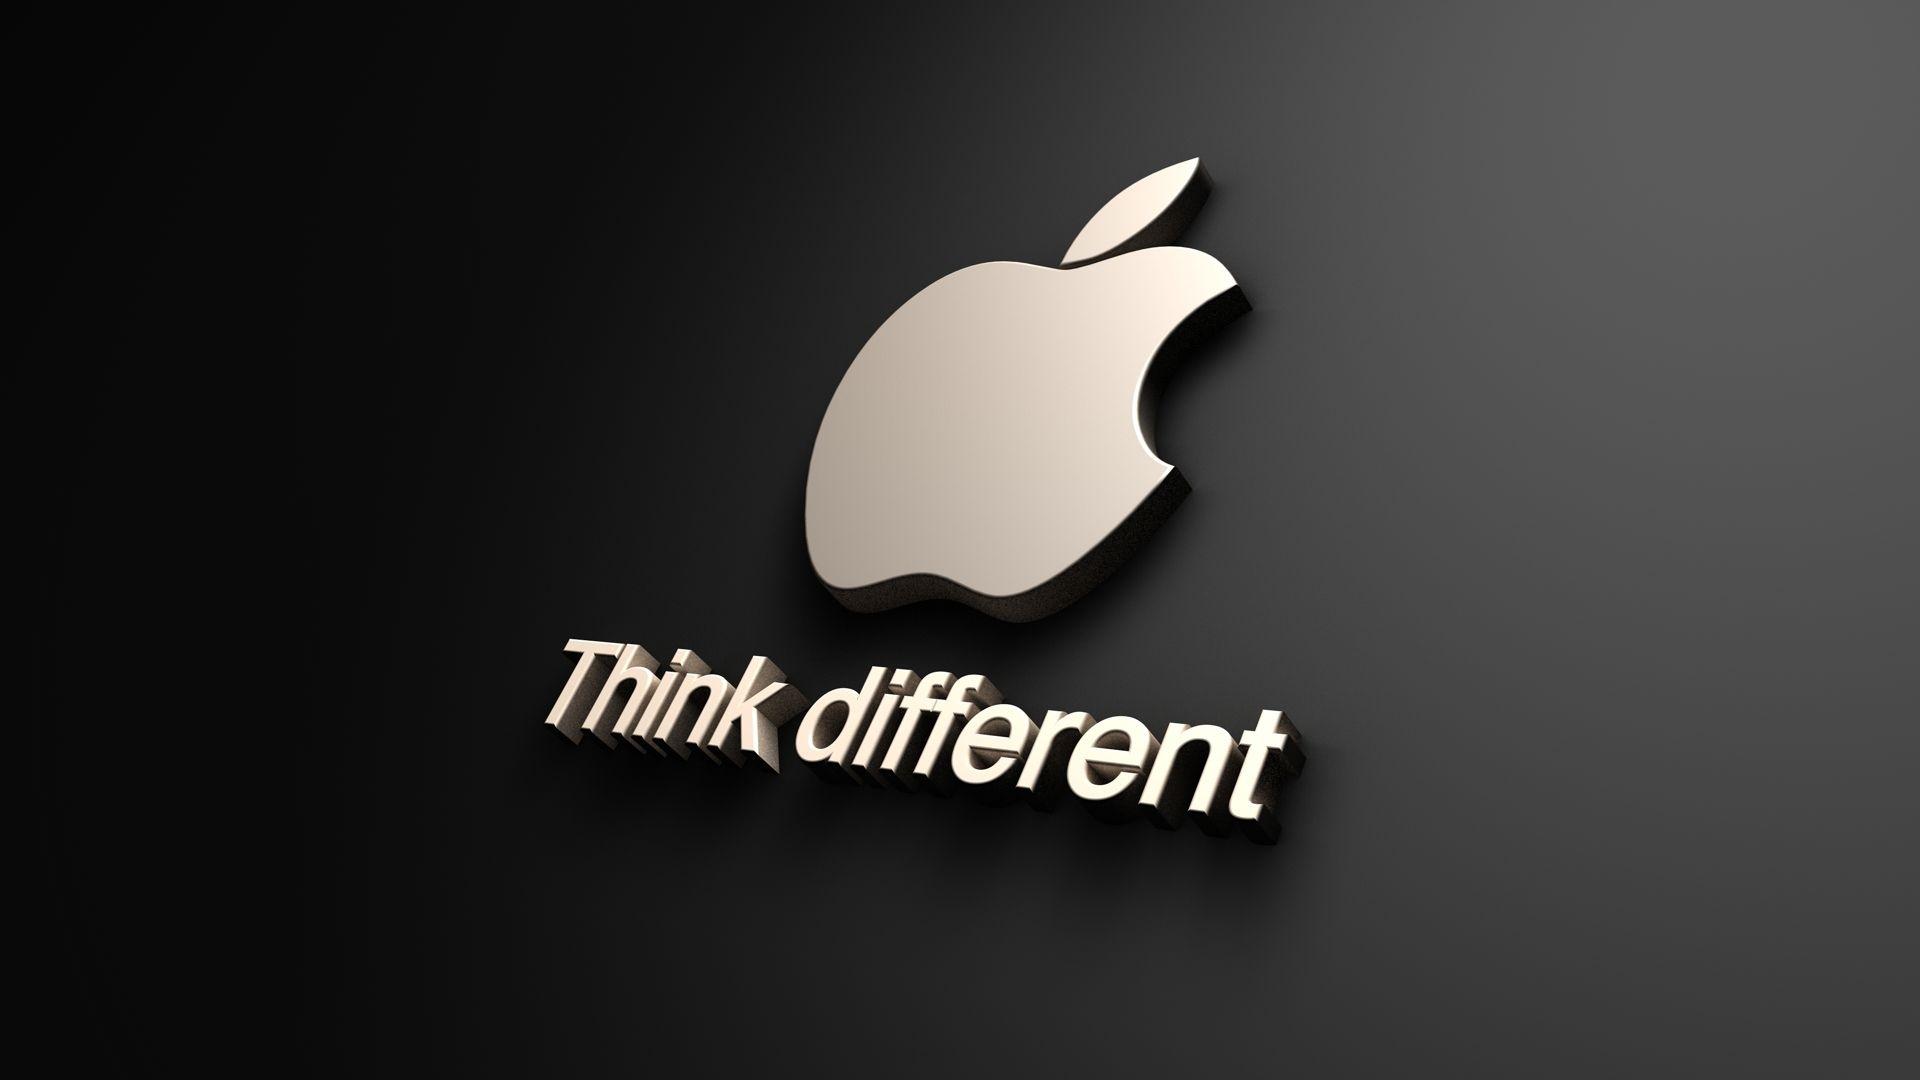 think different apple logo 1080p #1080p, #apple, #computers, #logo